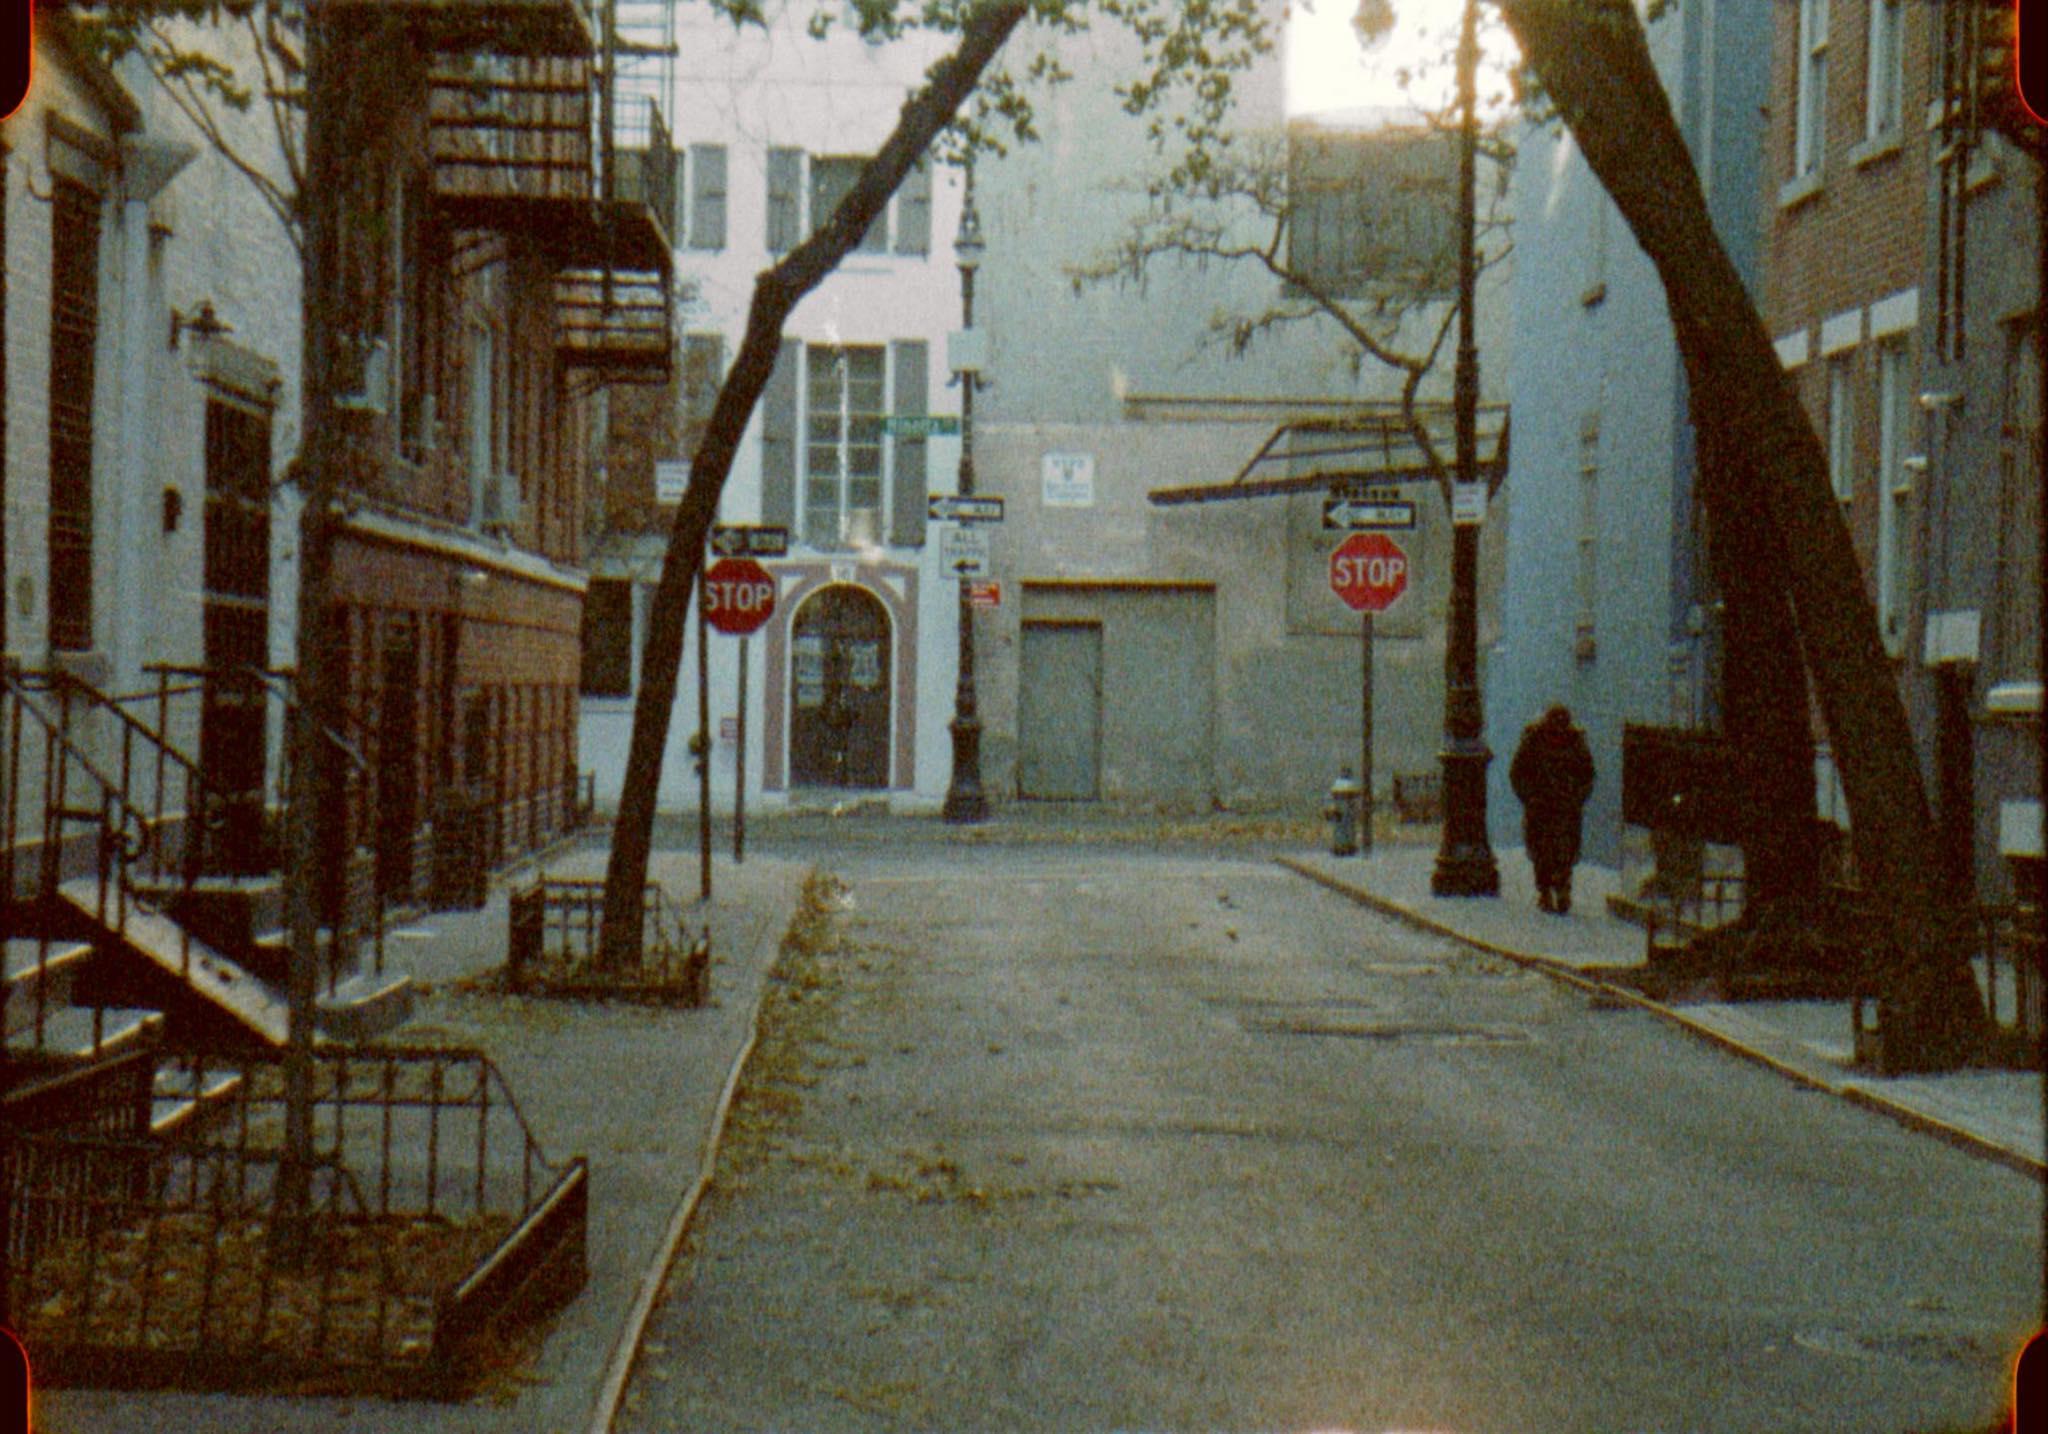 Absolute Street